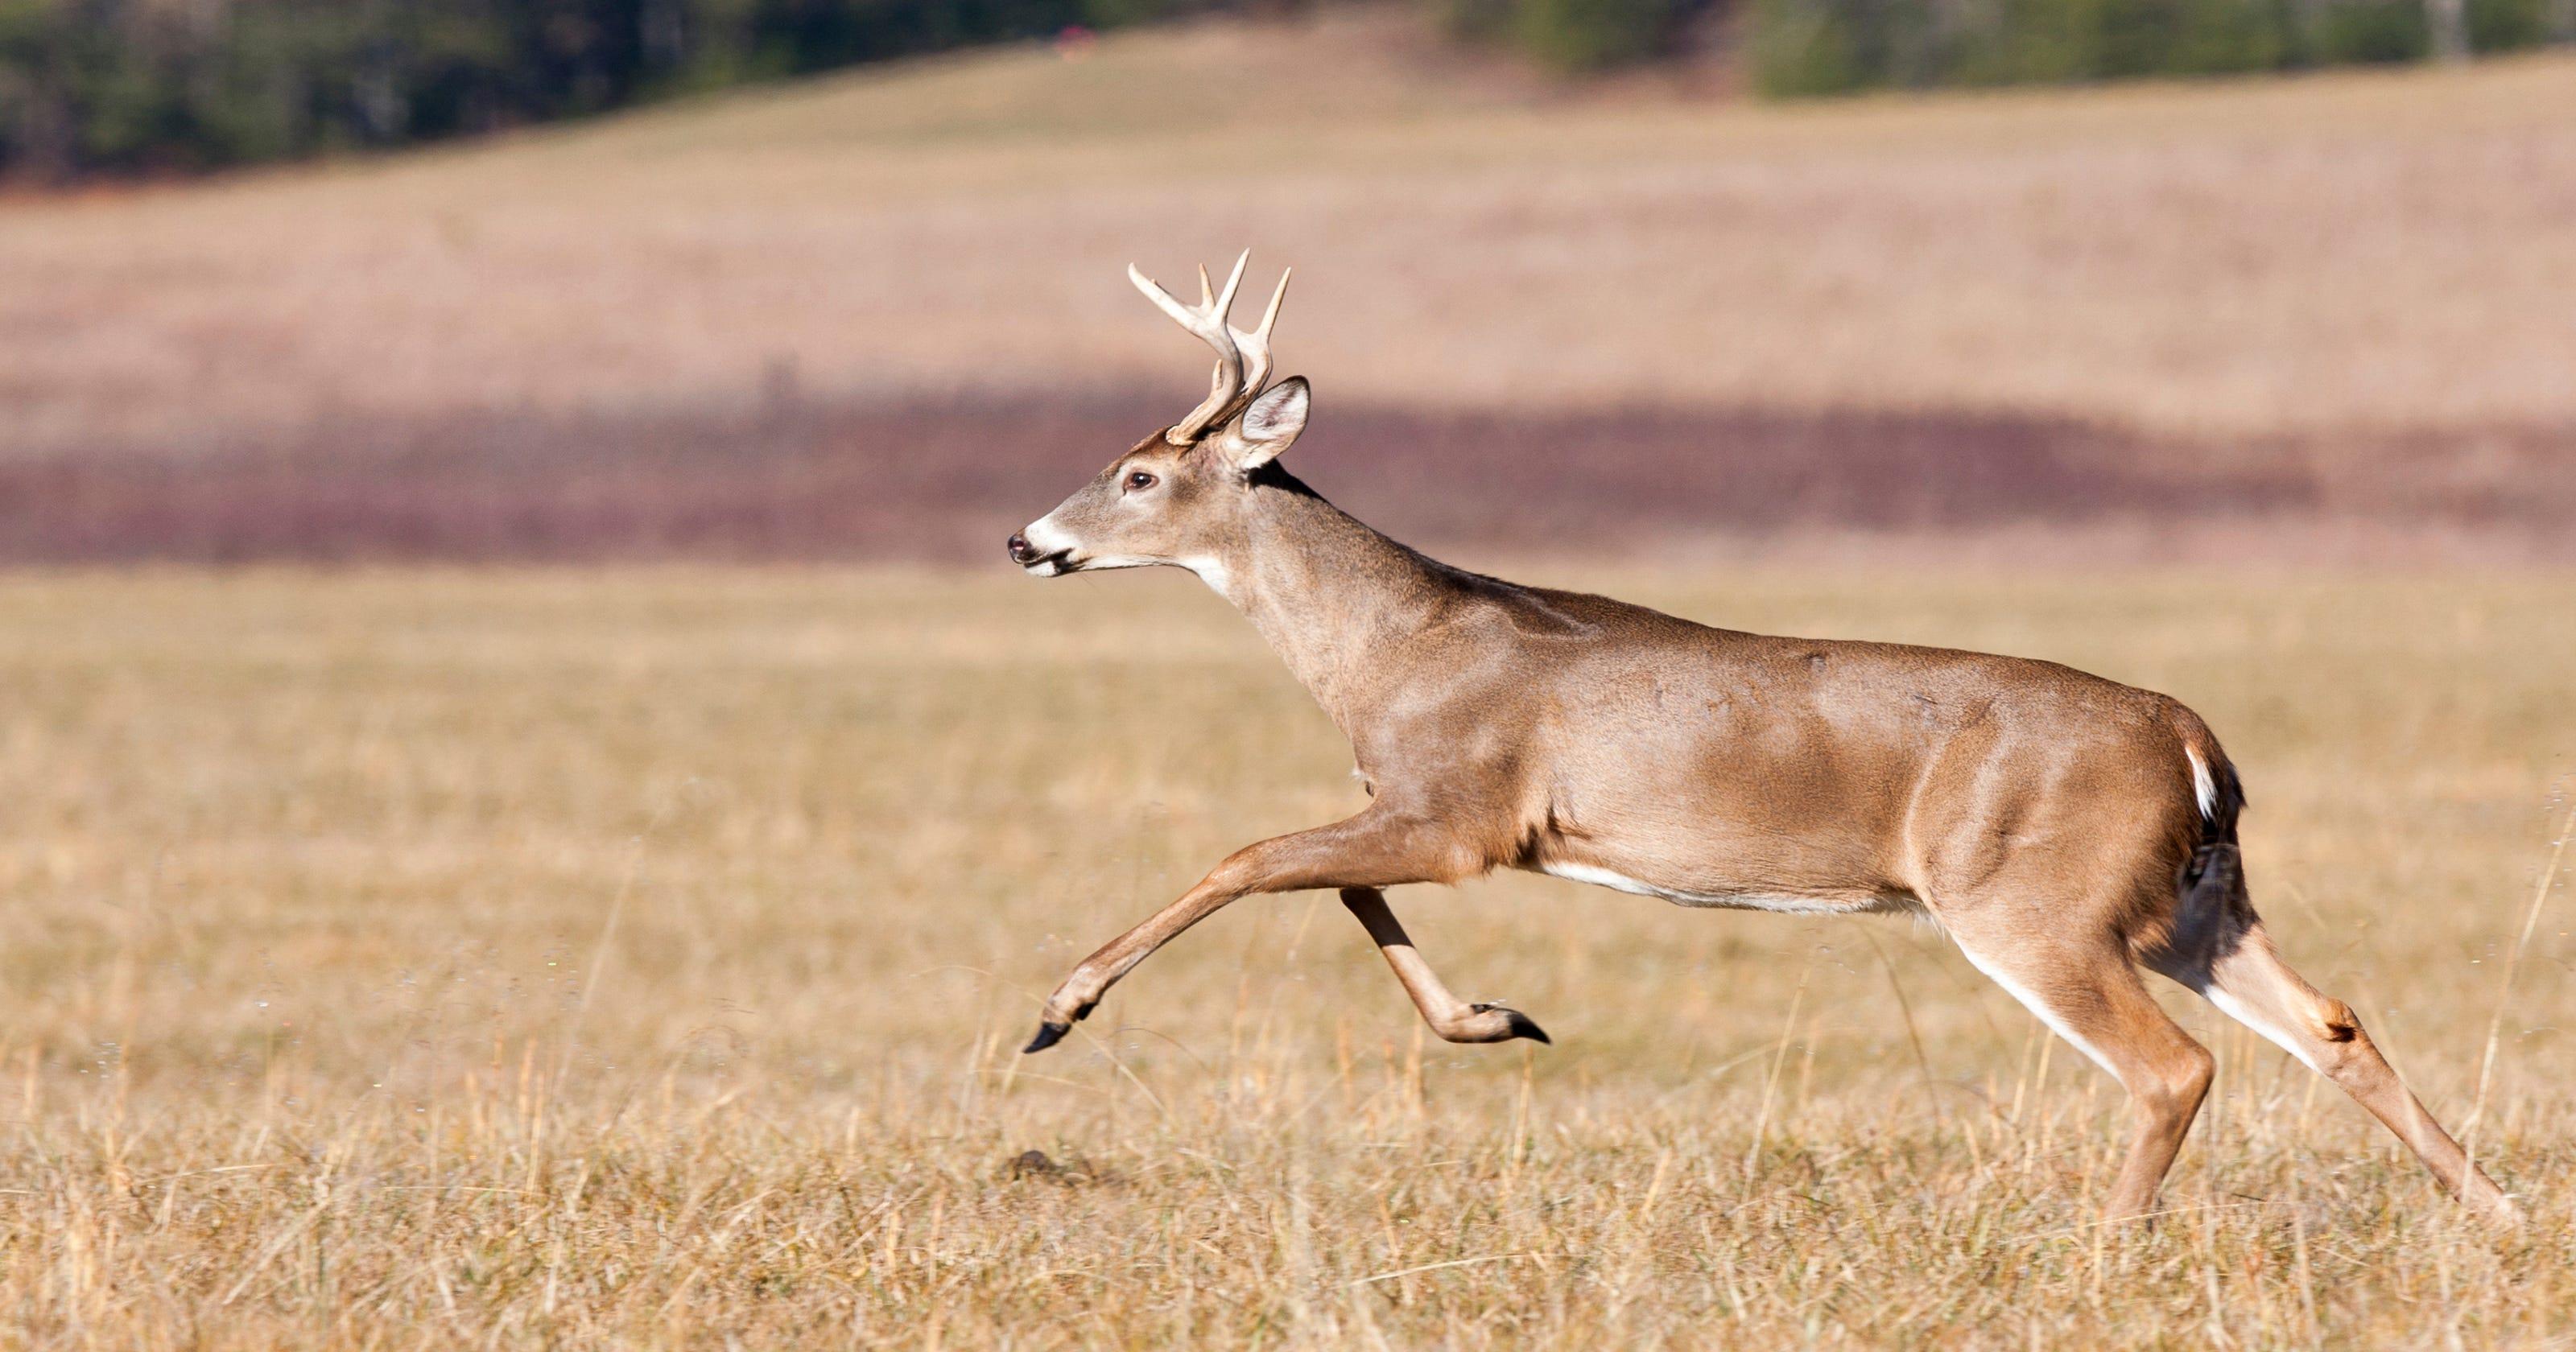 Hey Answer Man! Why do so many deer run into traffic?